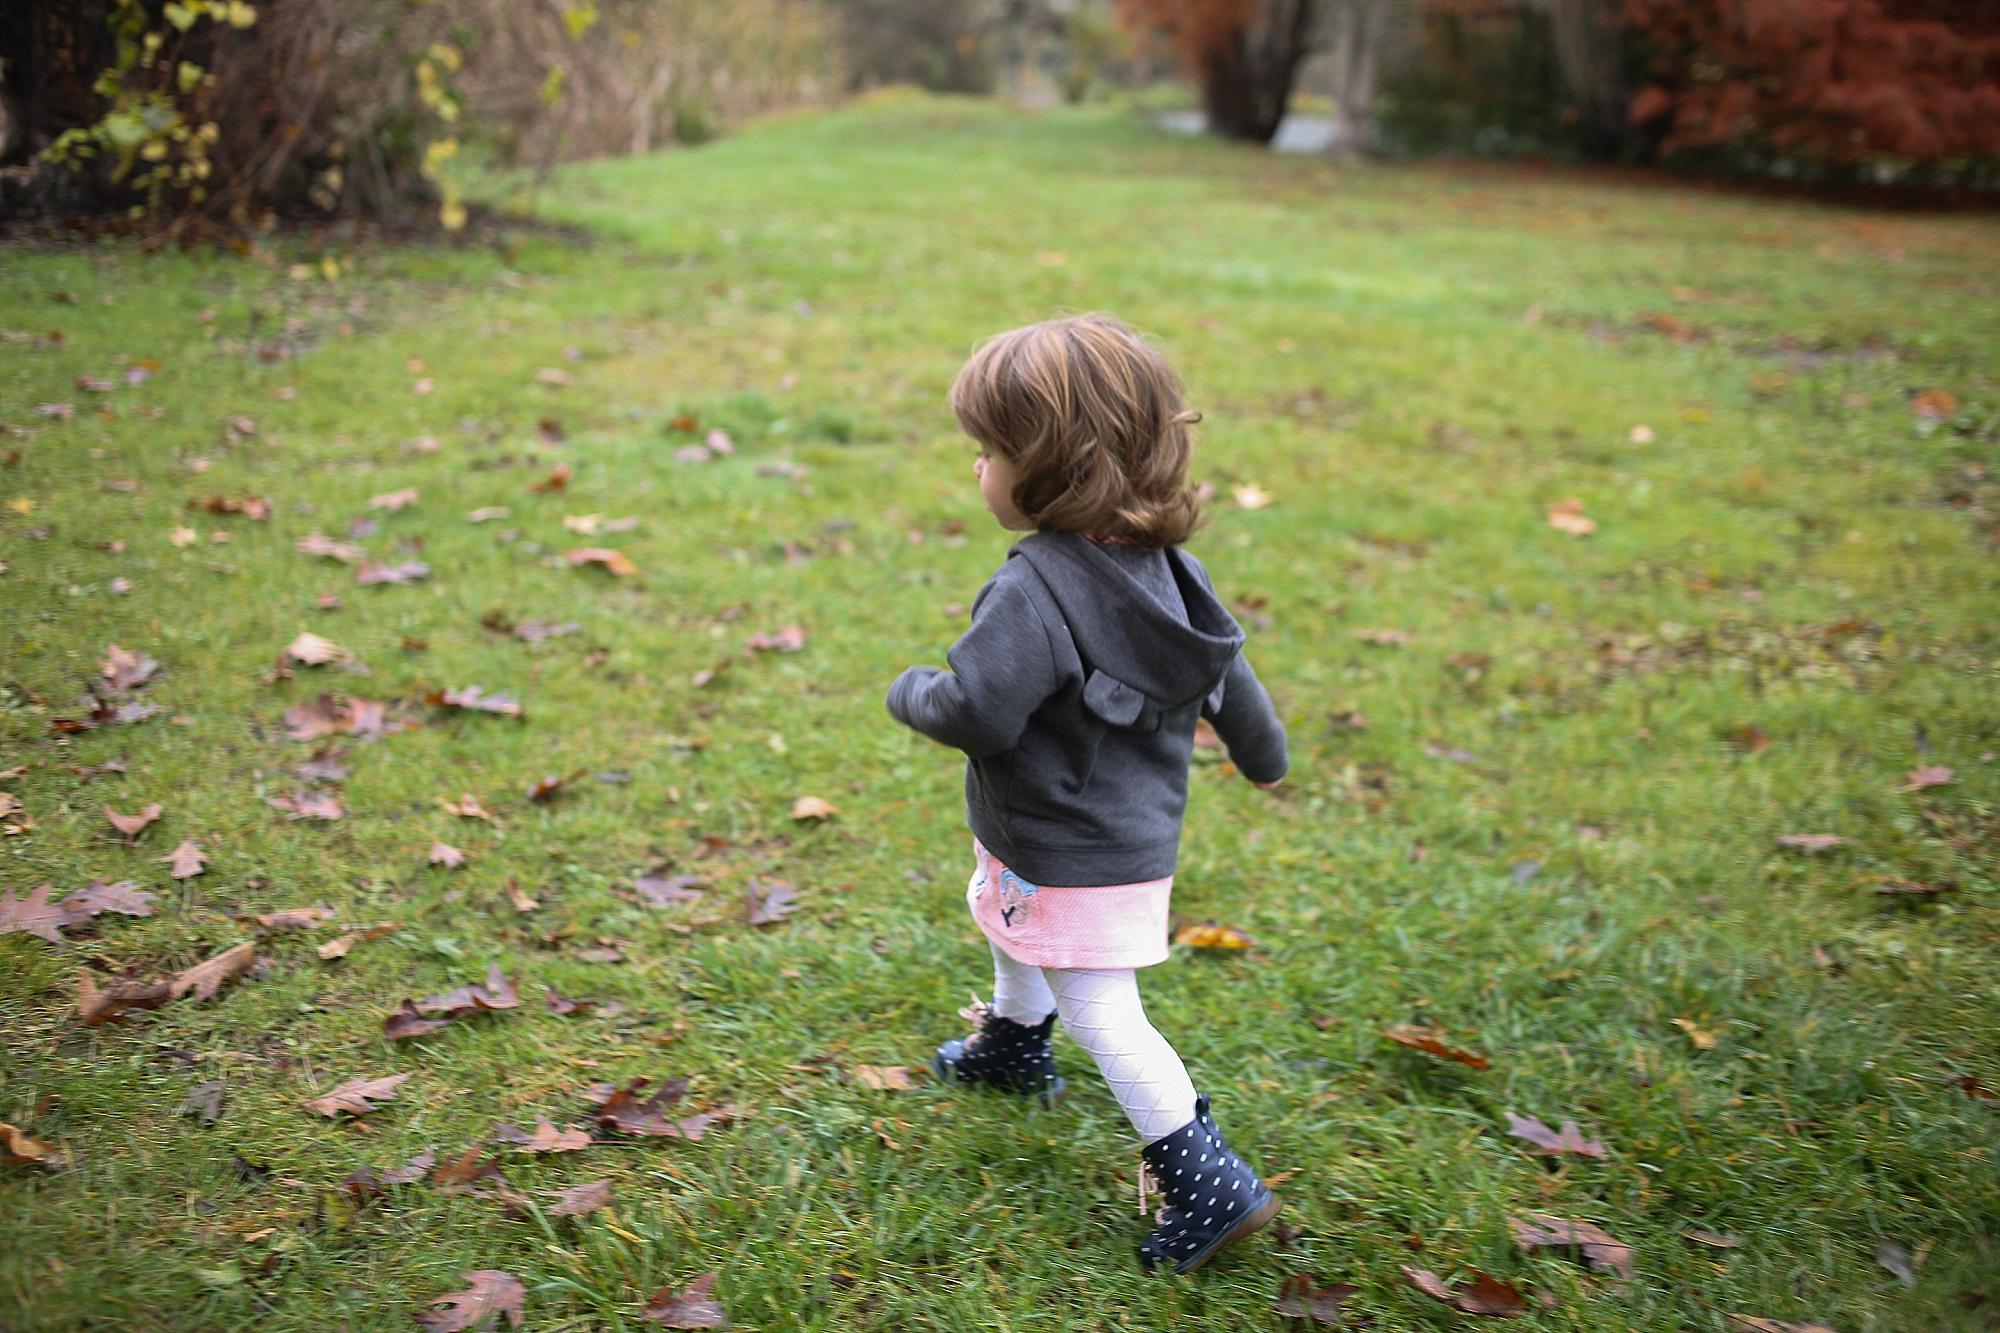 Fall Family Photos at the Virginia Tech Duck Pond | Blacksburg Family Photographer, Holly Cromer